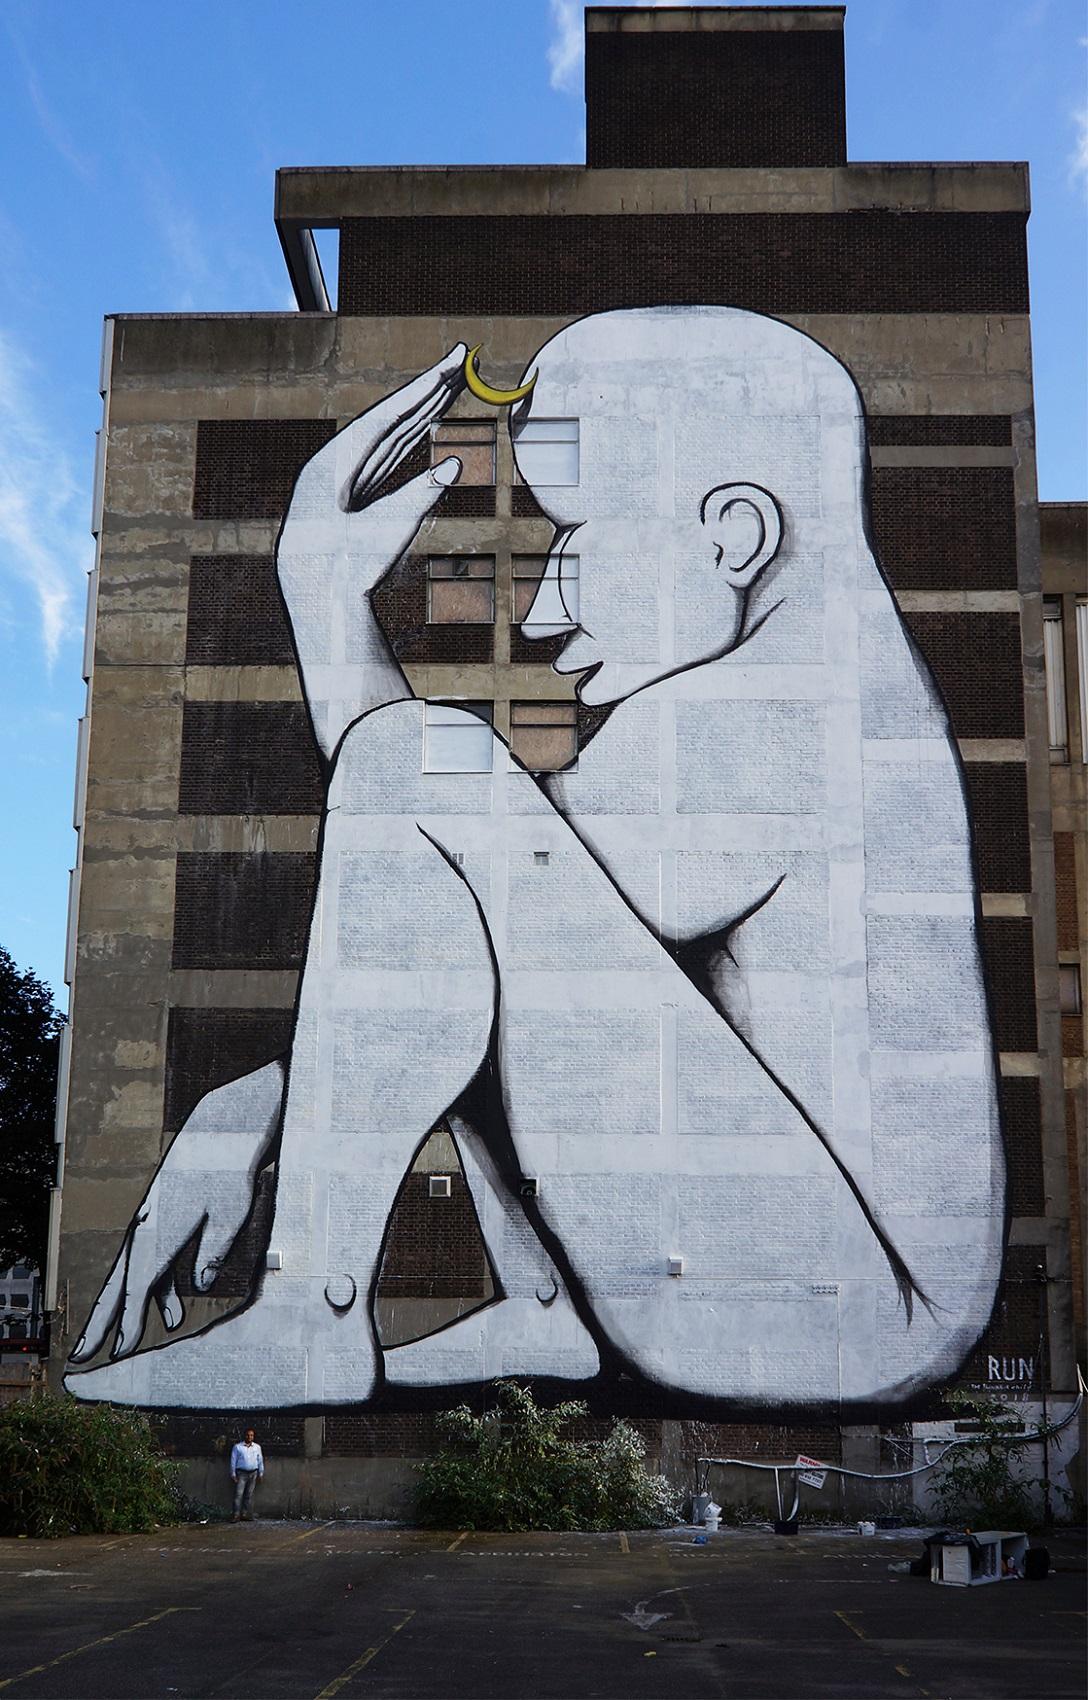 RUN Giacomo Bufarini Street Art Croydon London